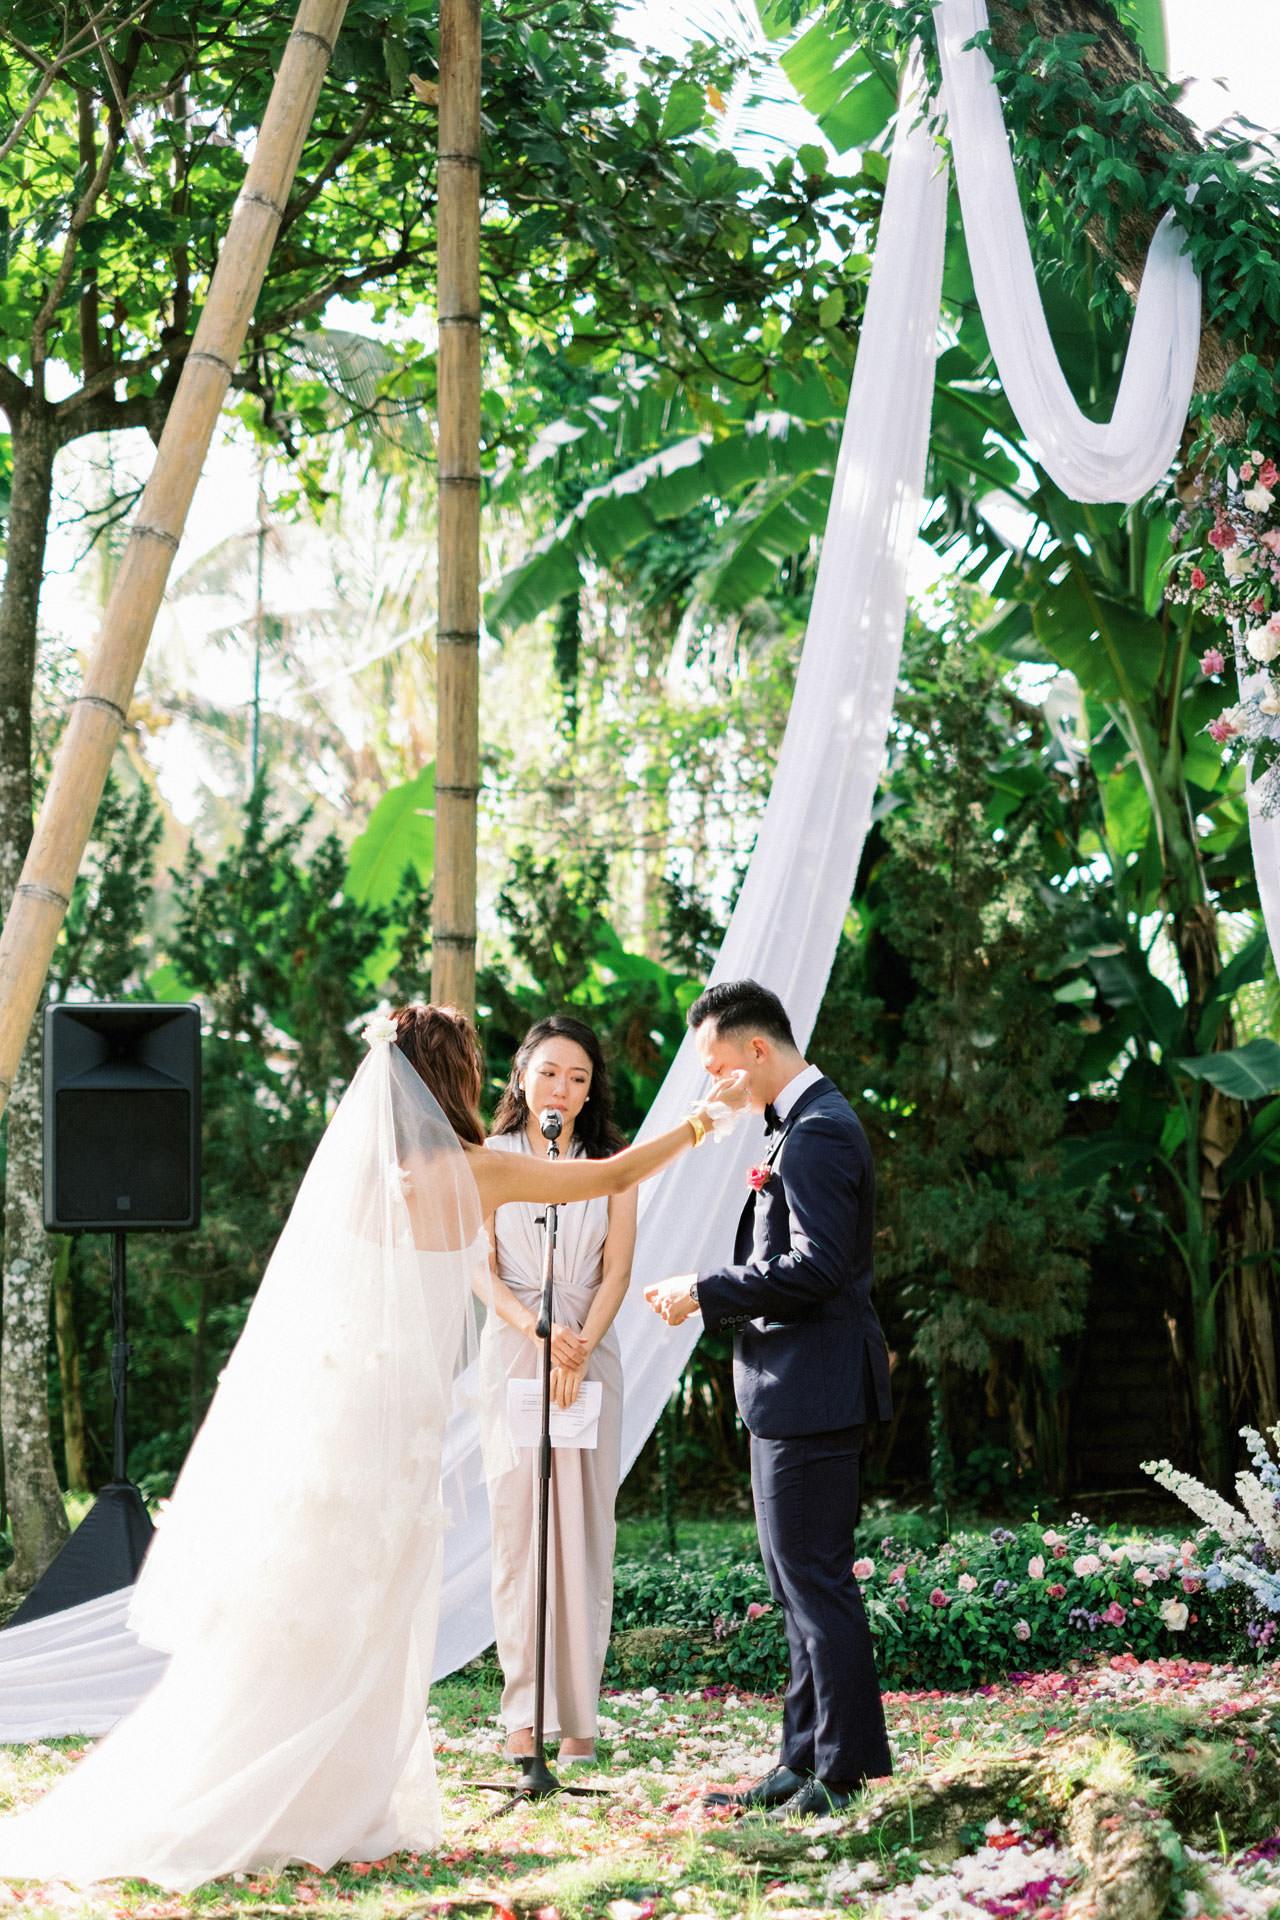 Whimsical Bali Forest Wedding at Puri Nirwana  38